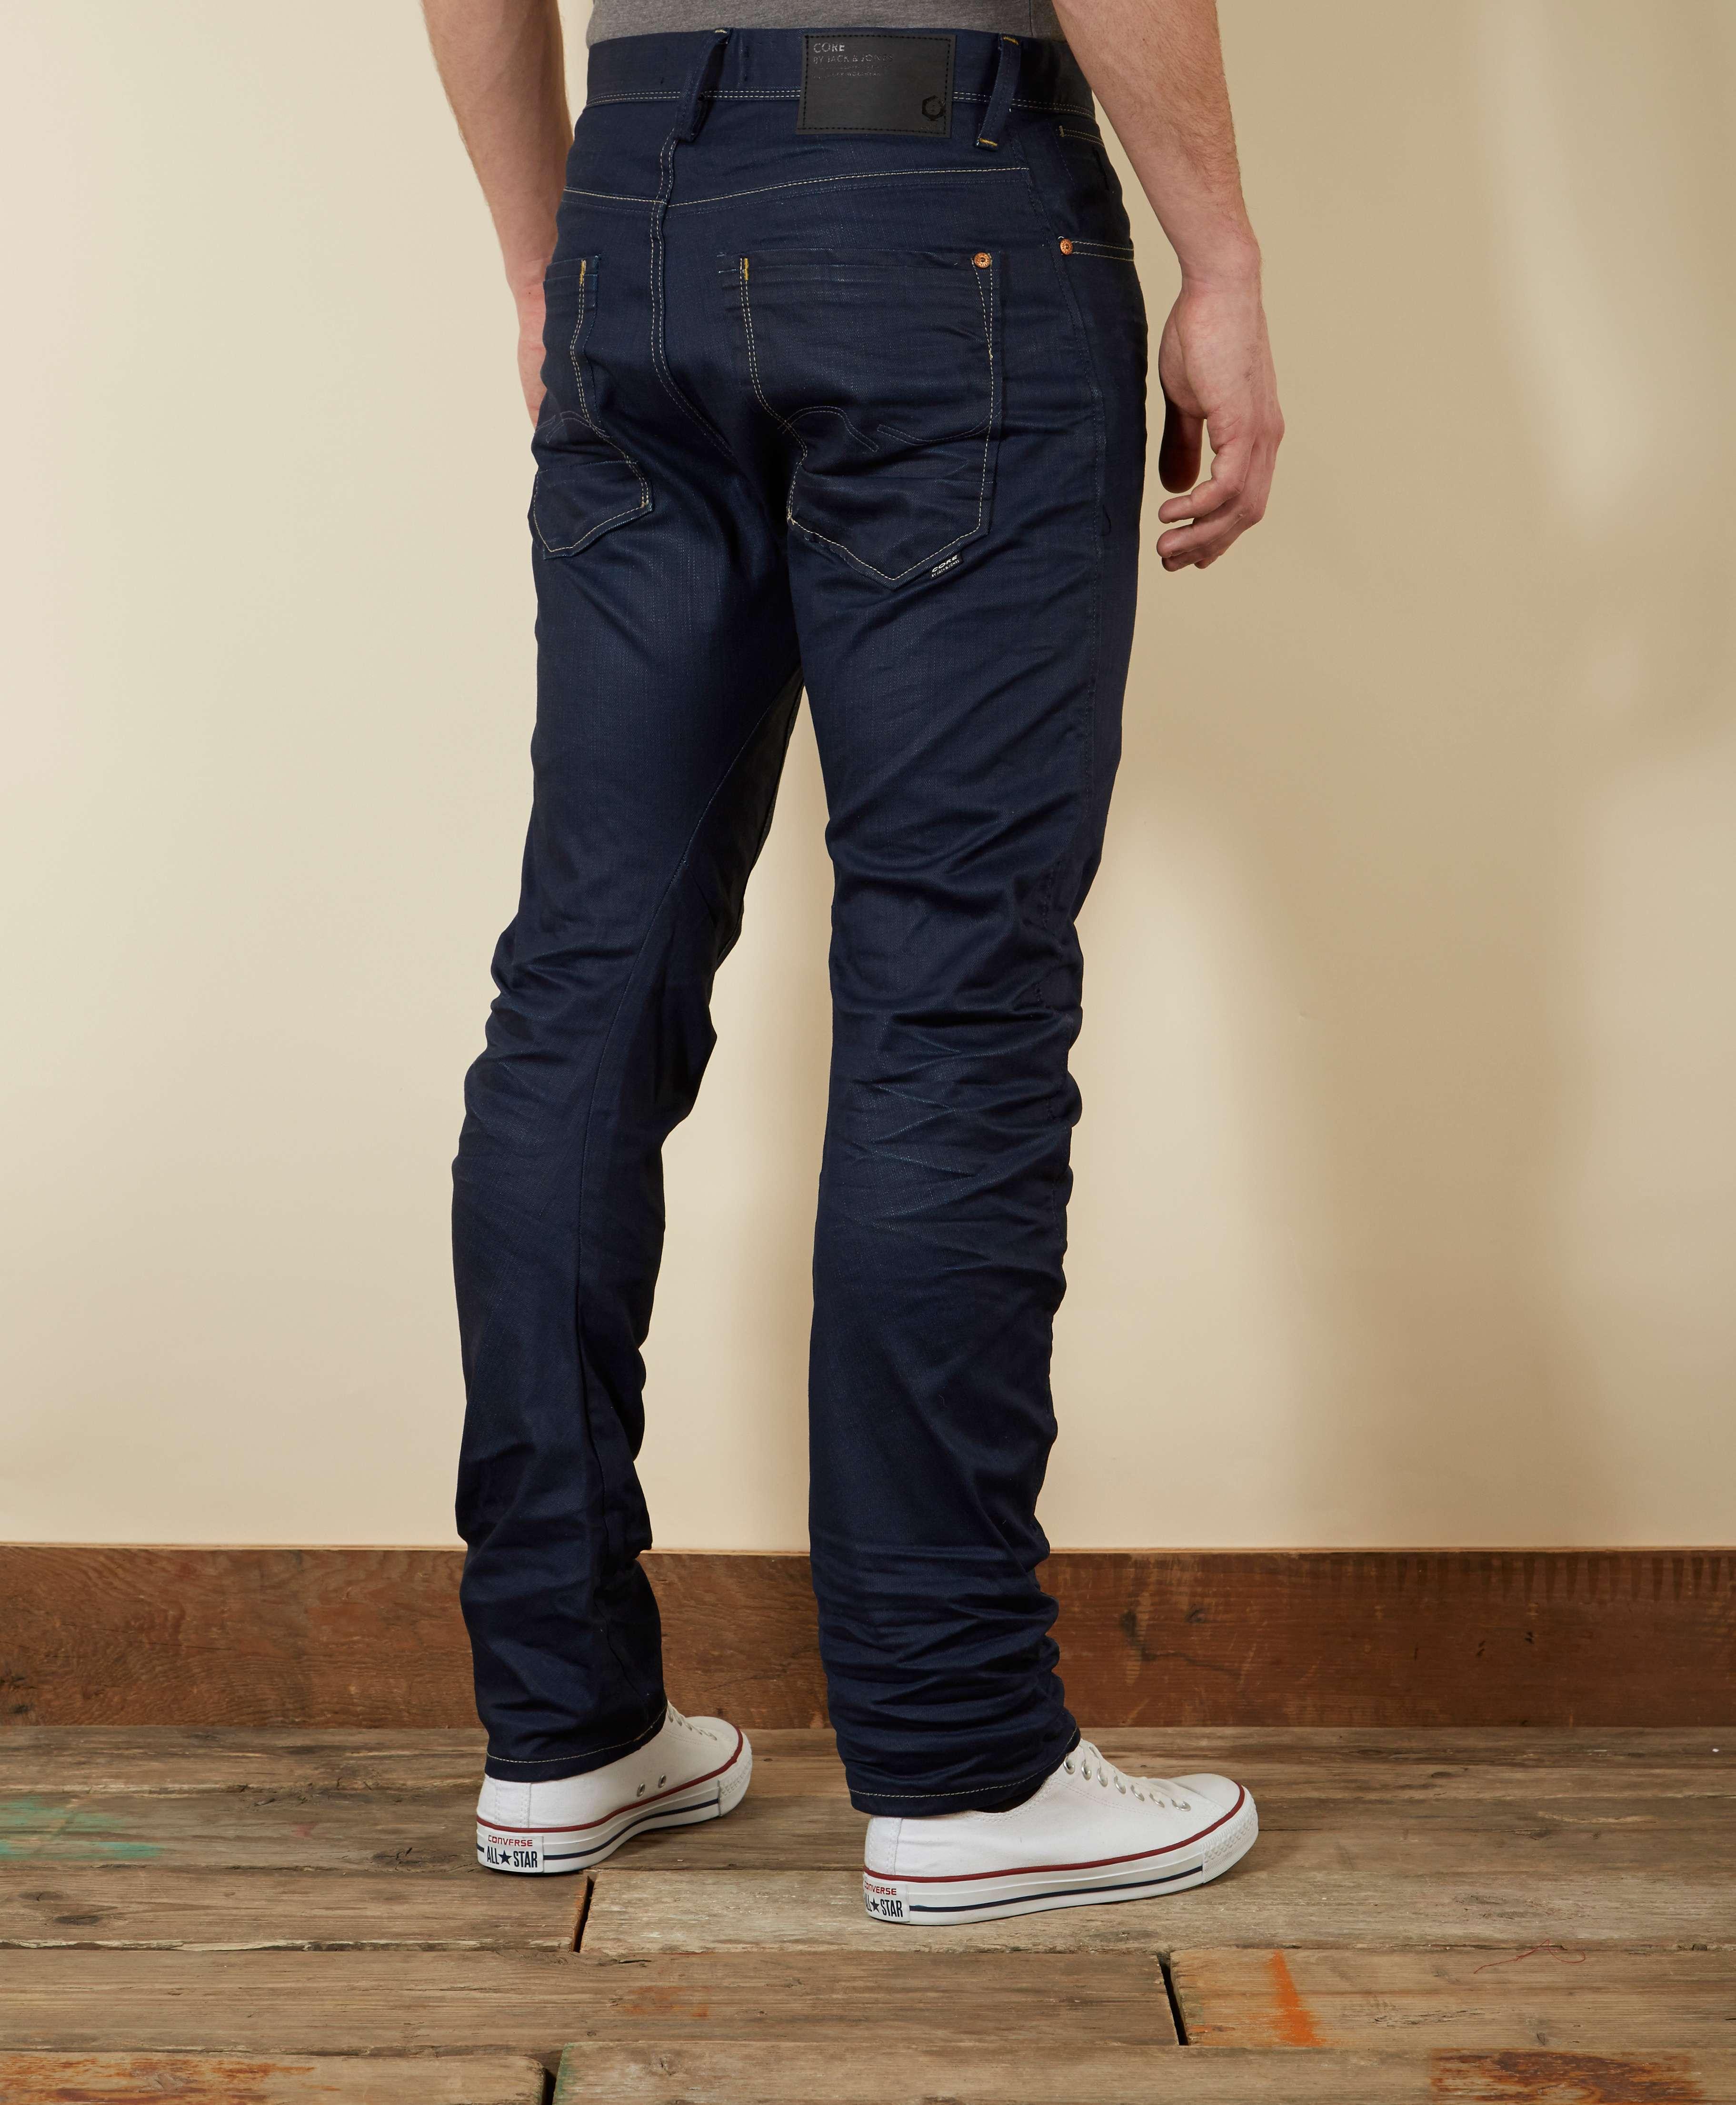 jack jones core stanmorgan jj751 anti fit jeans scotts menswear. Black Bedroom Furniture Sets. Home Design Ideas